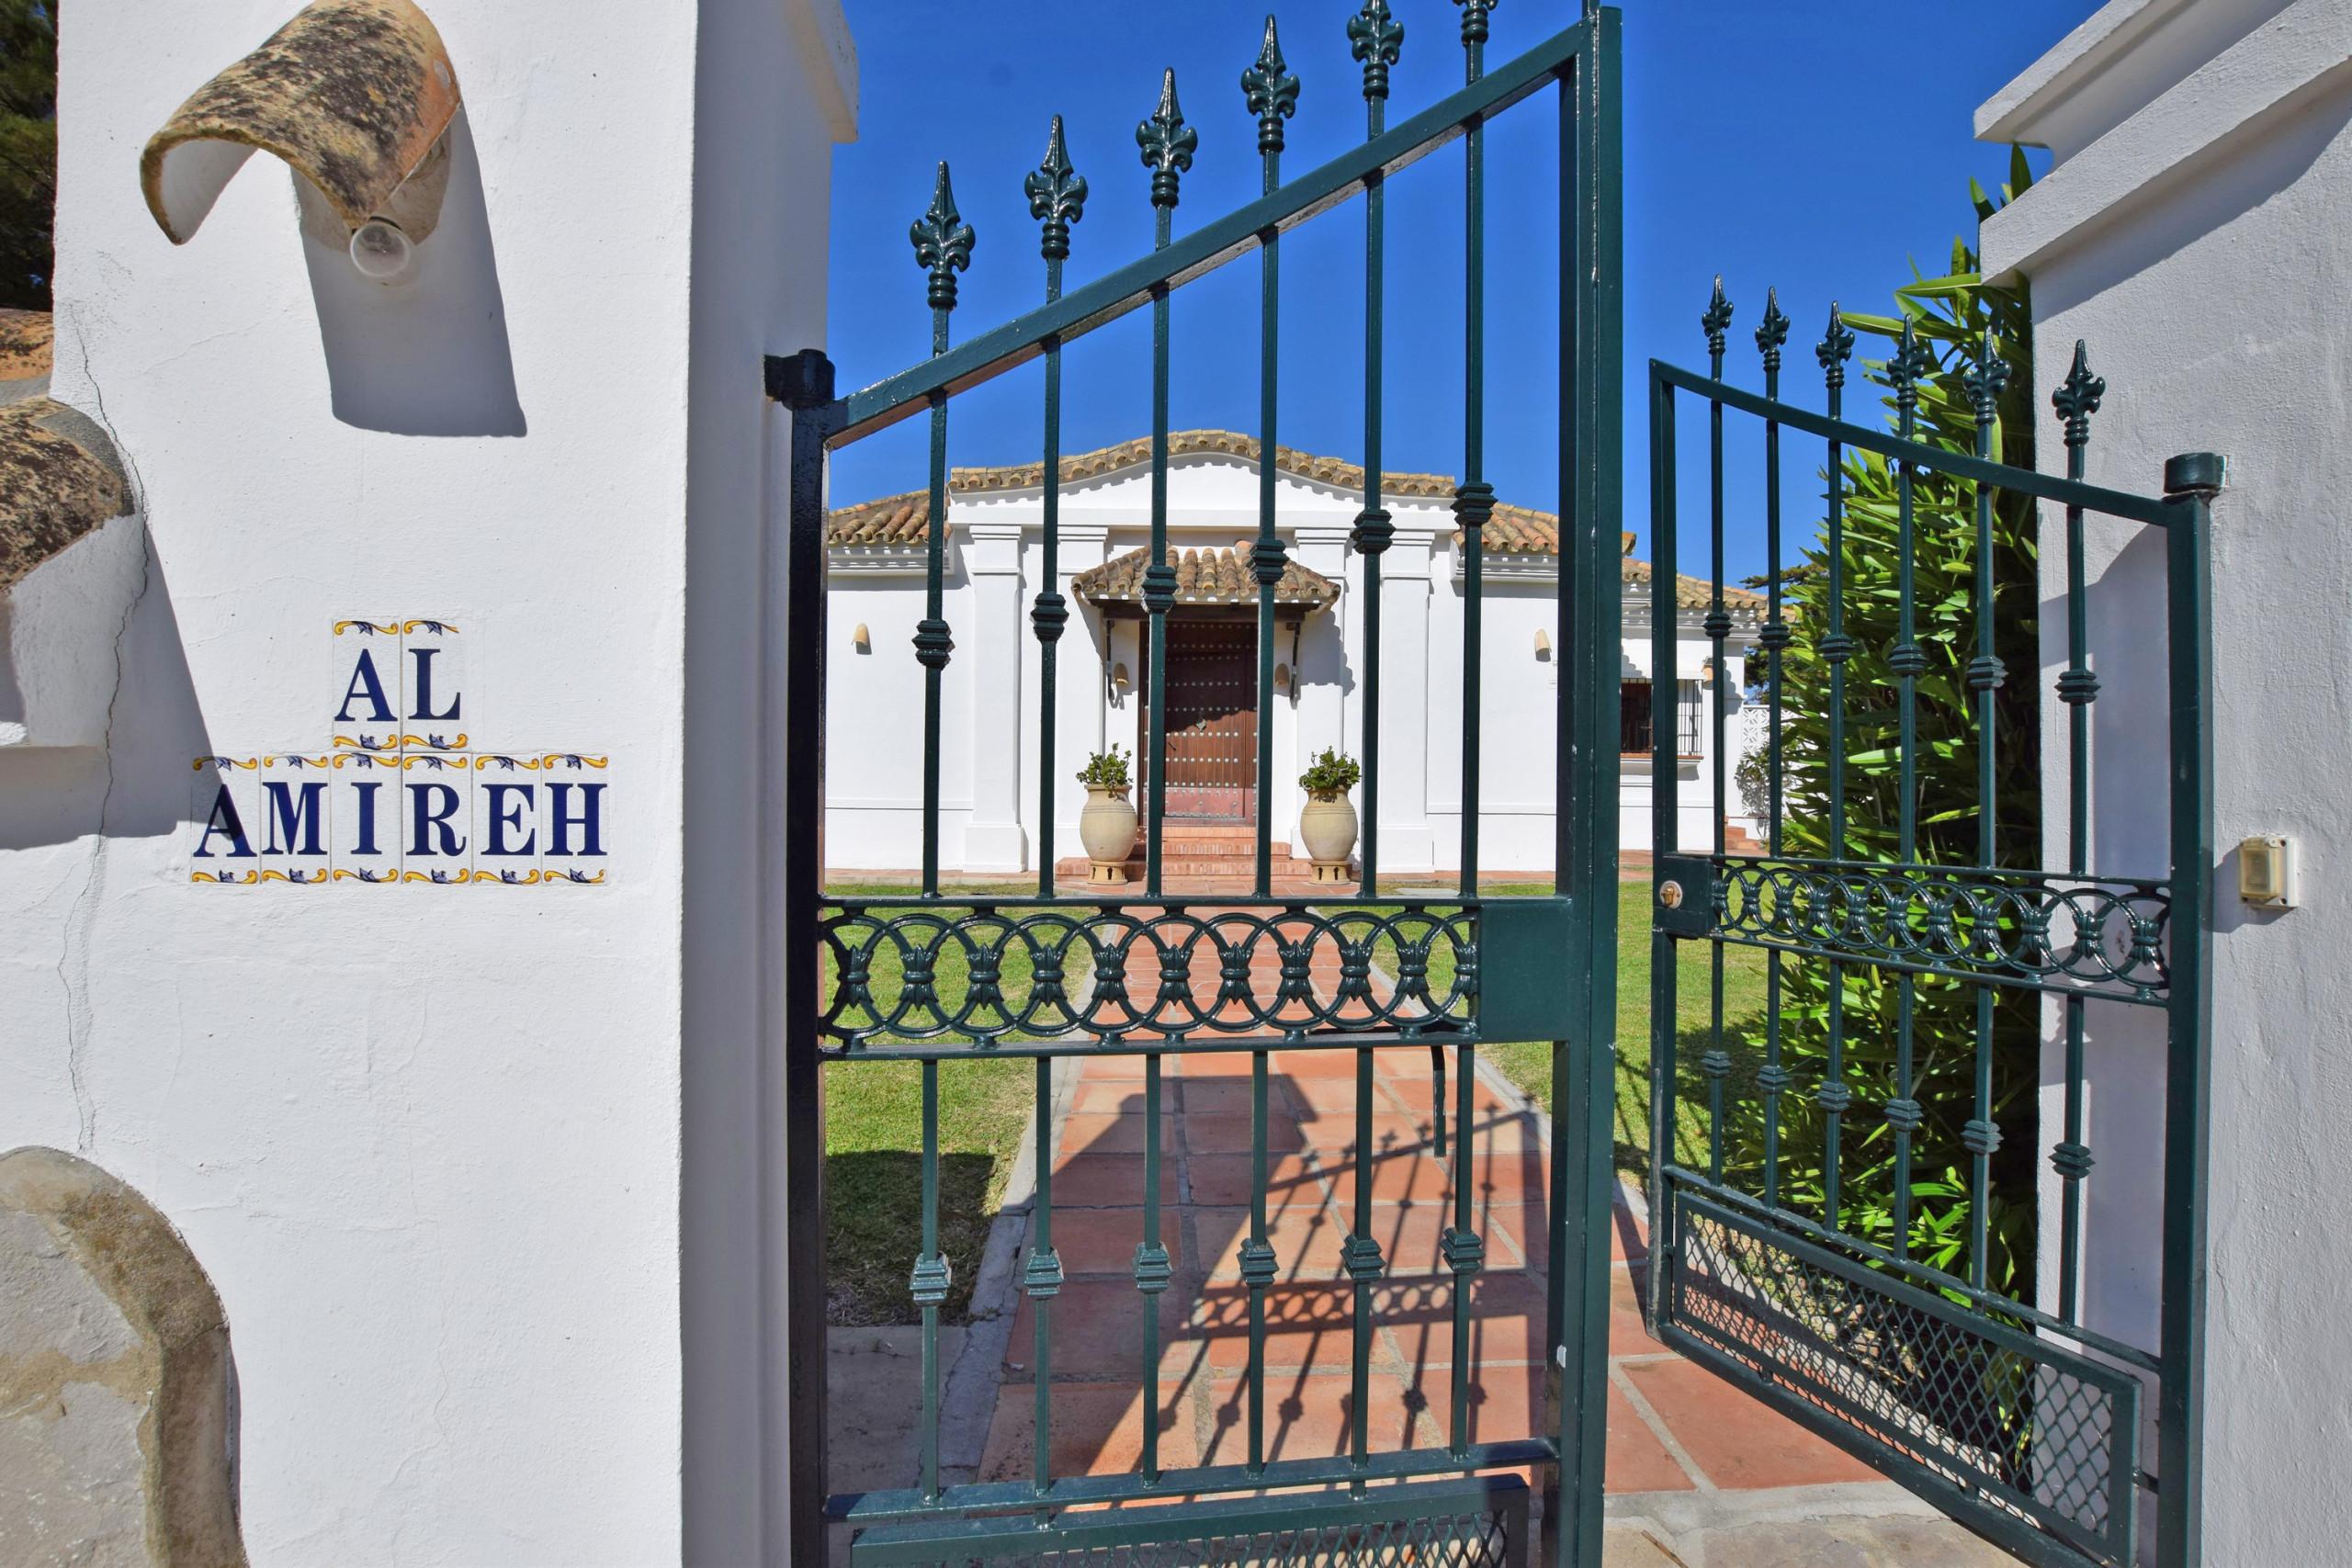 Al Amireh - Acceso a Villa